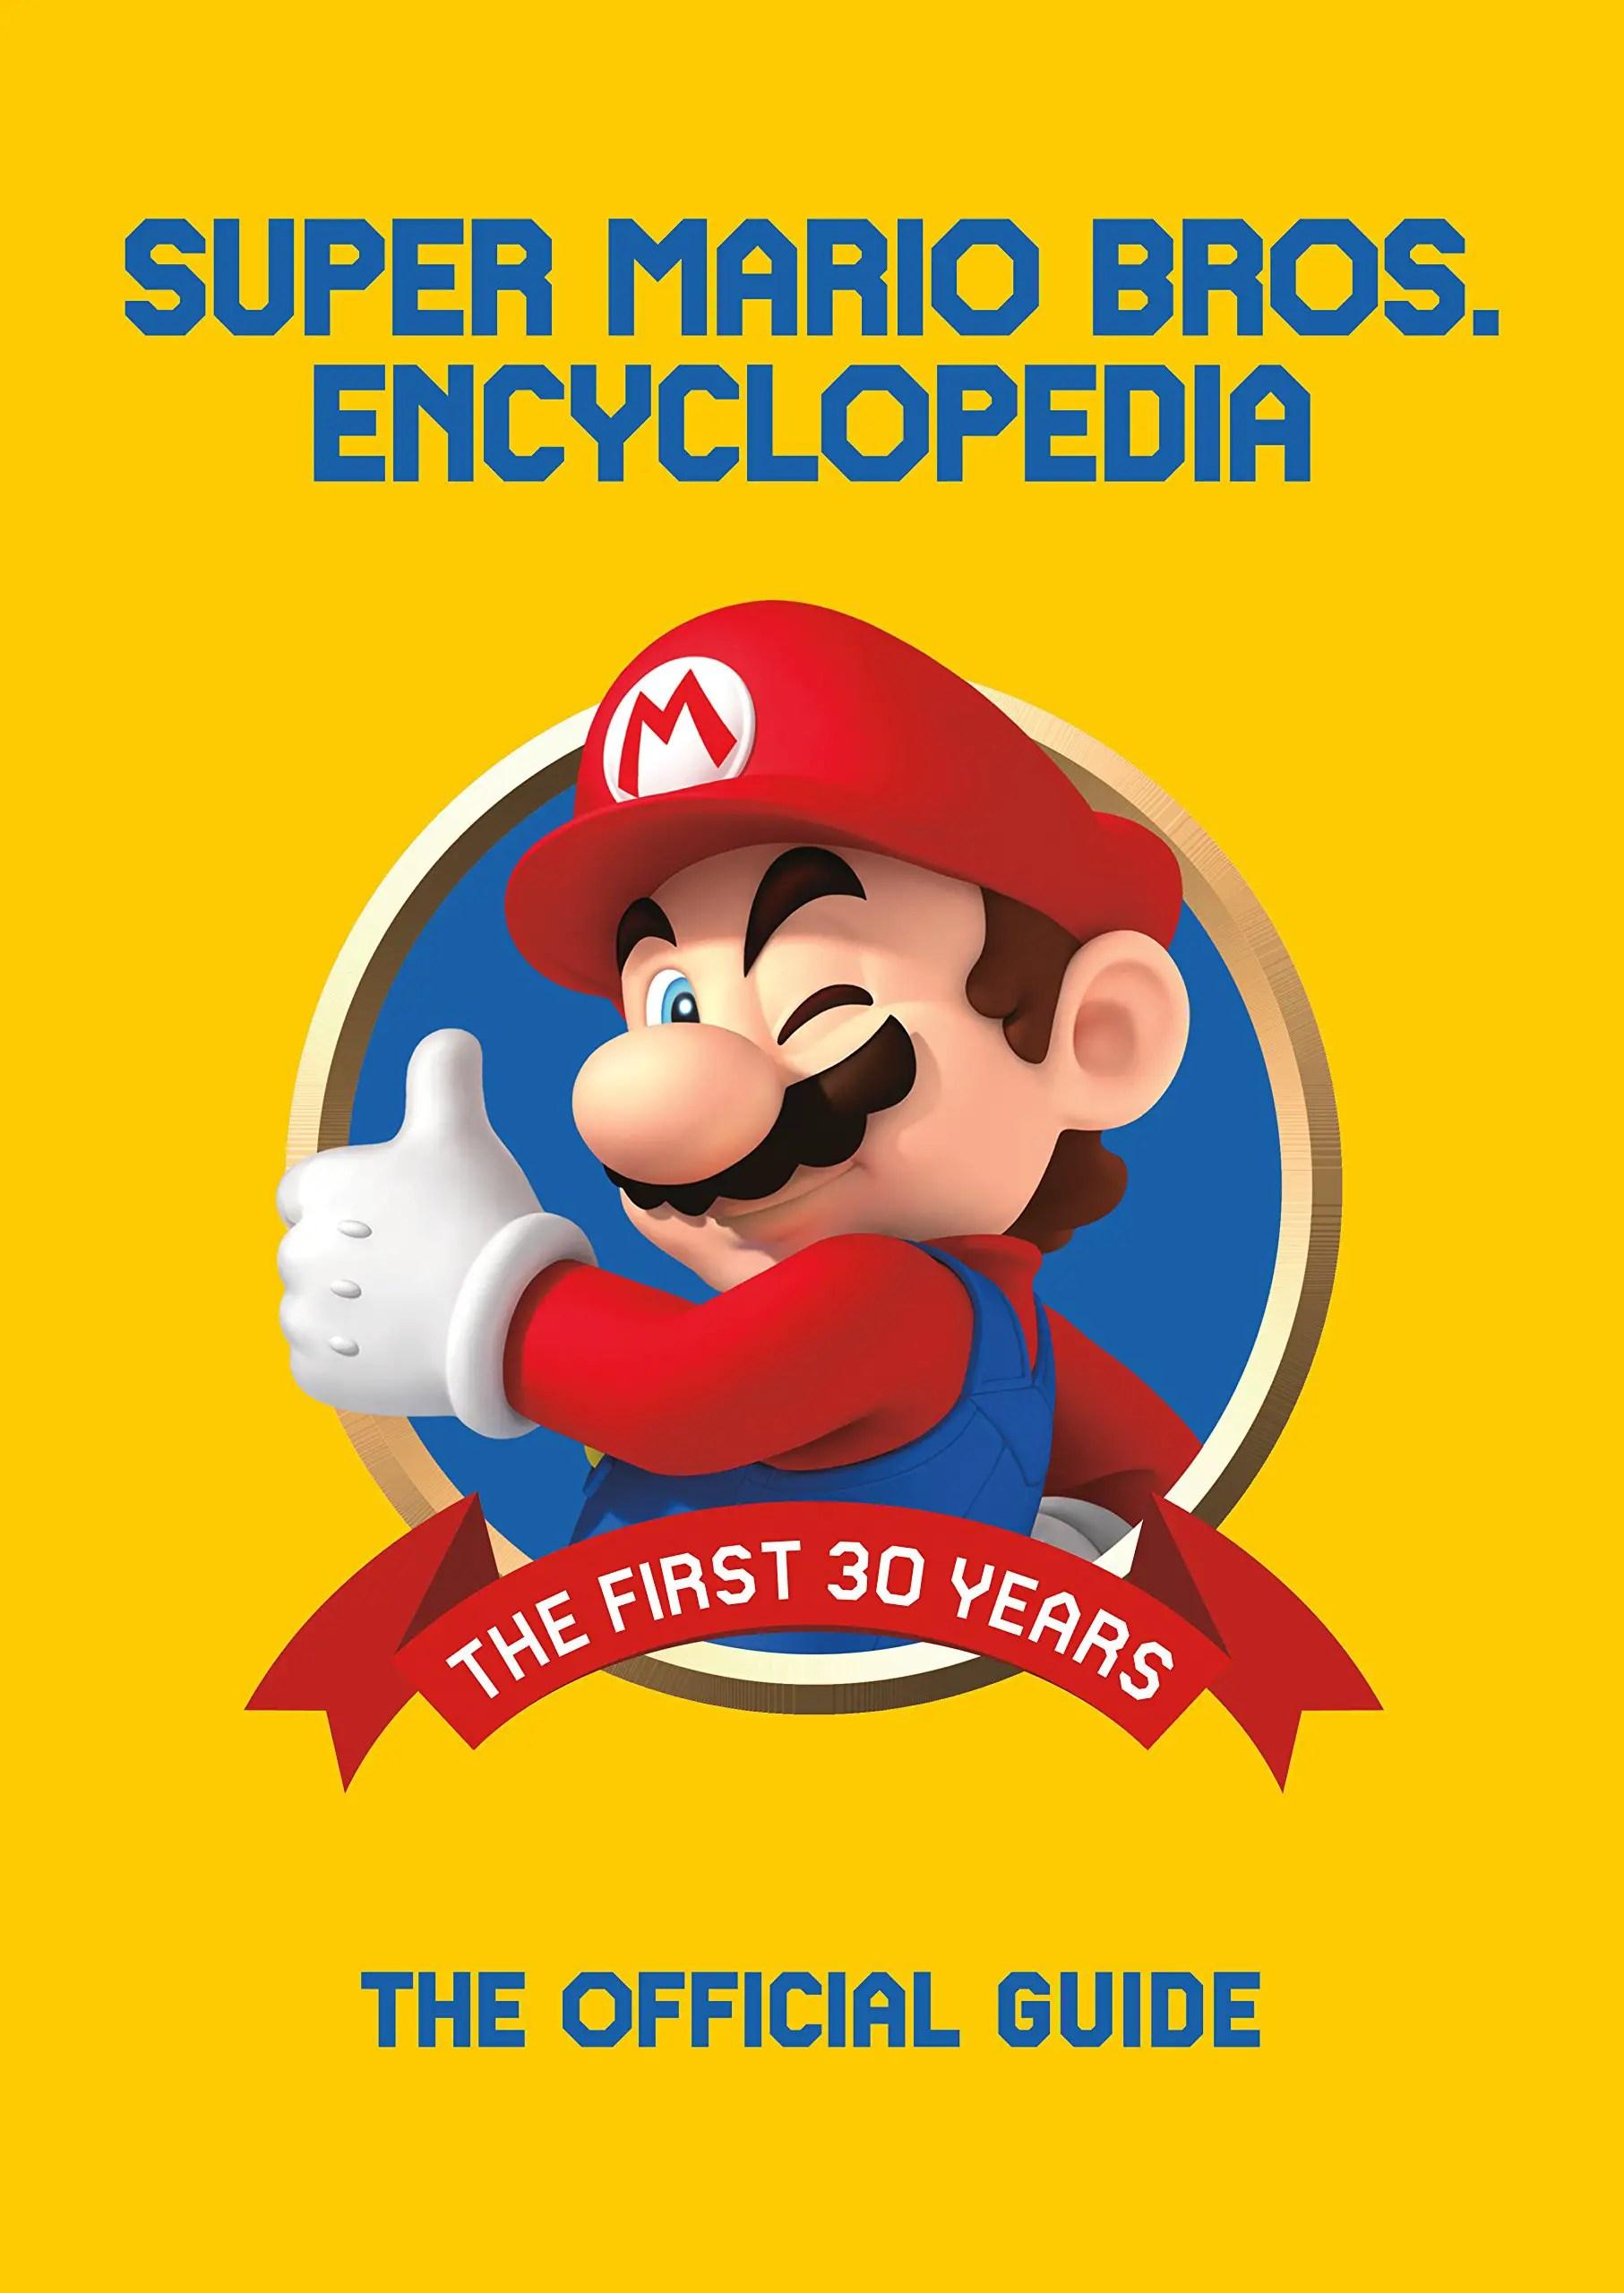 Super Mario Bros. Encyclopedia Review - Plagiarist plumbers?